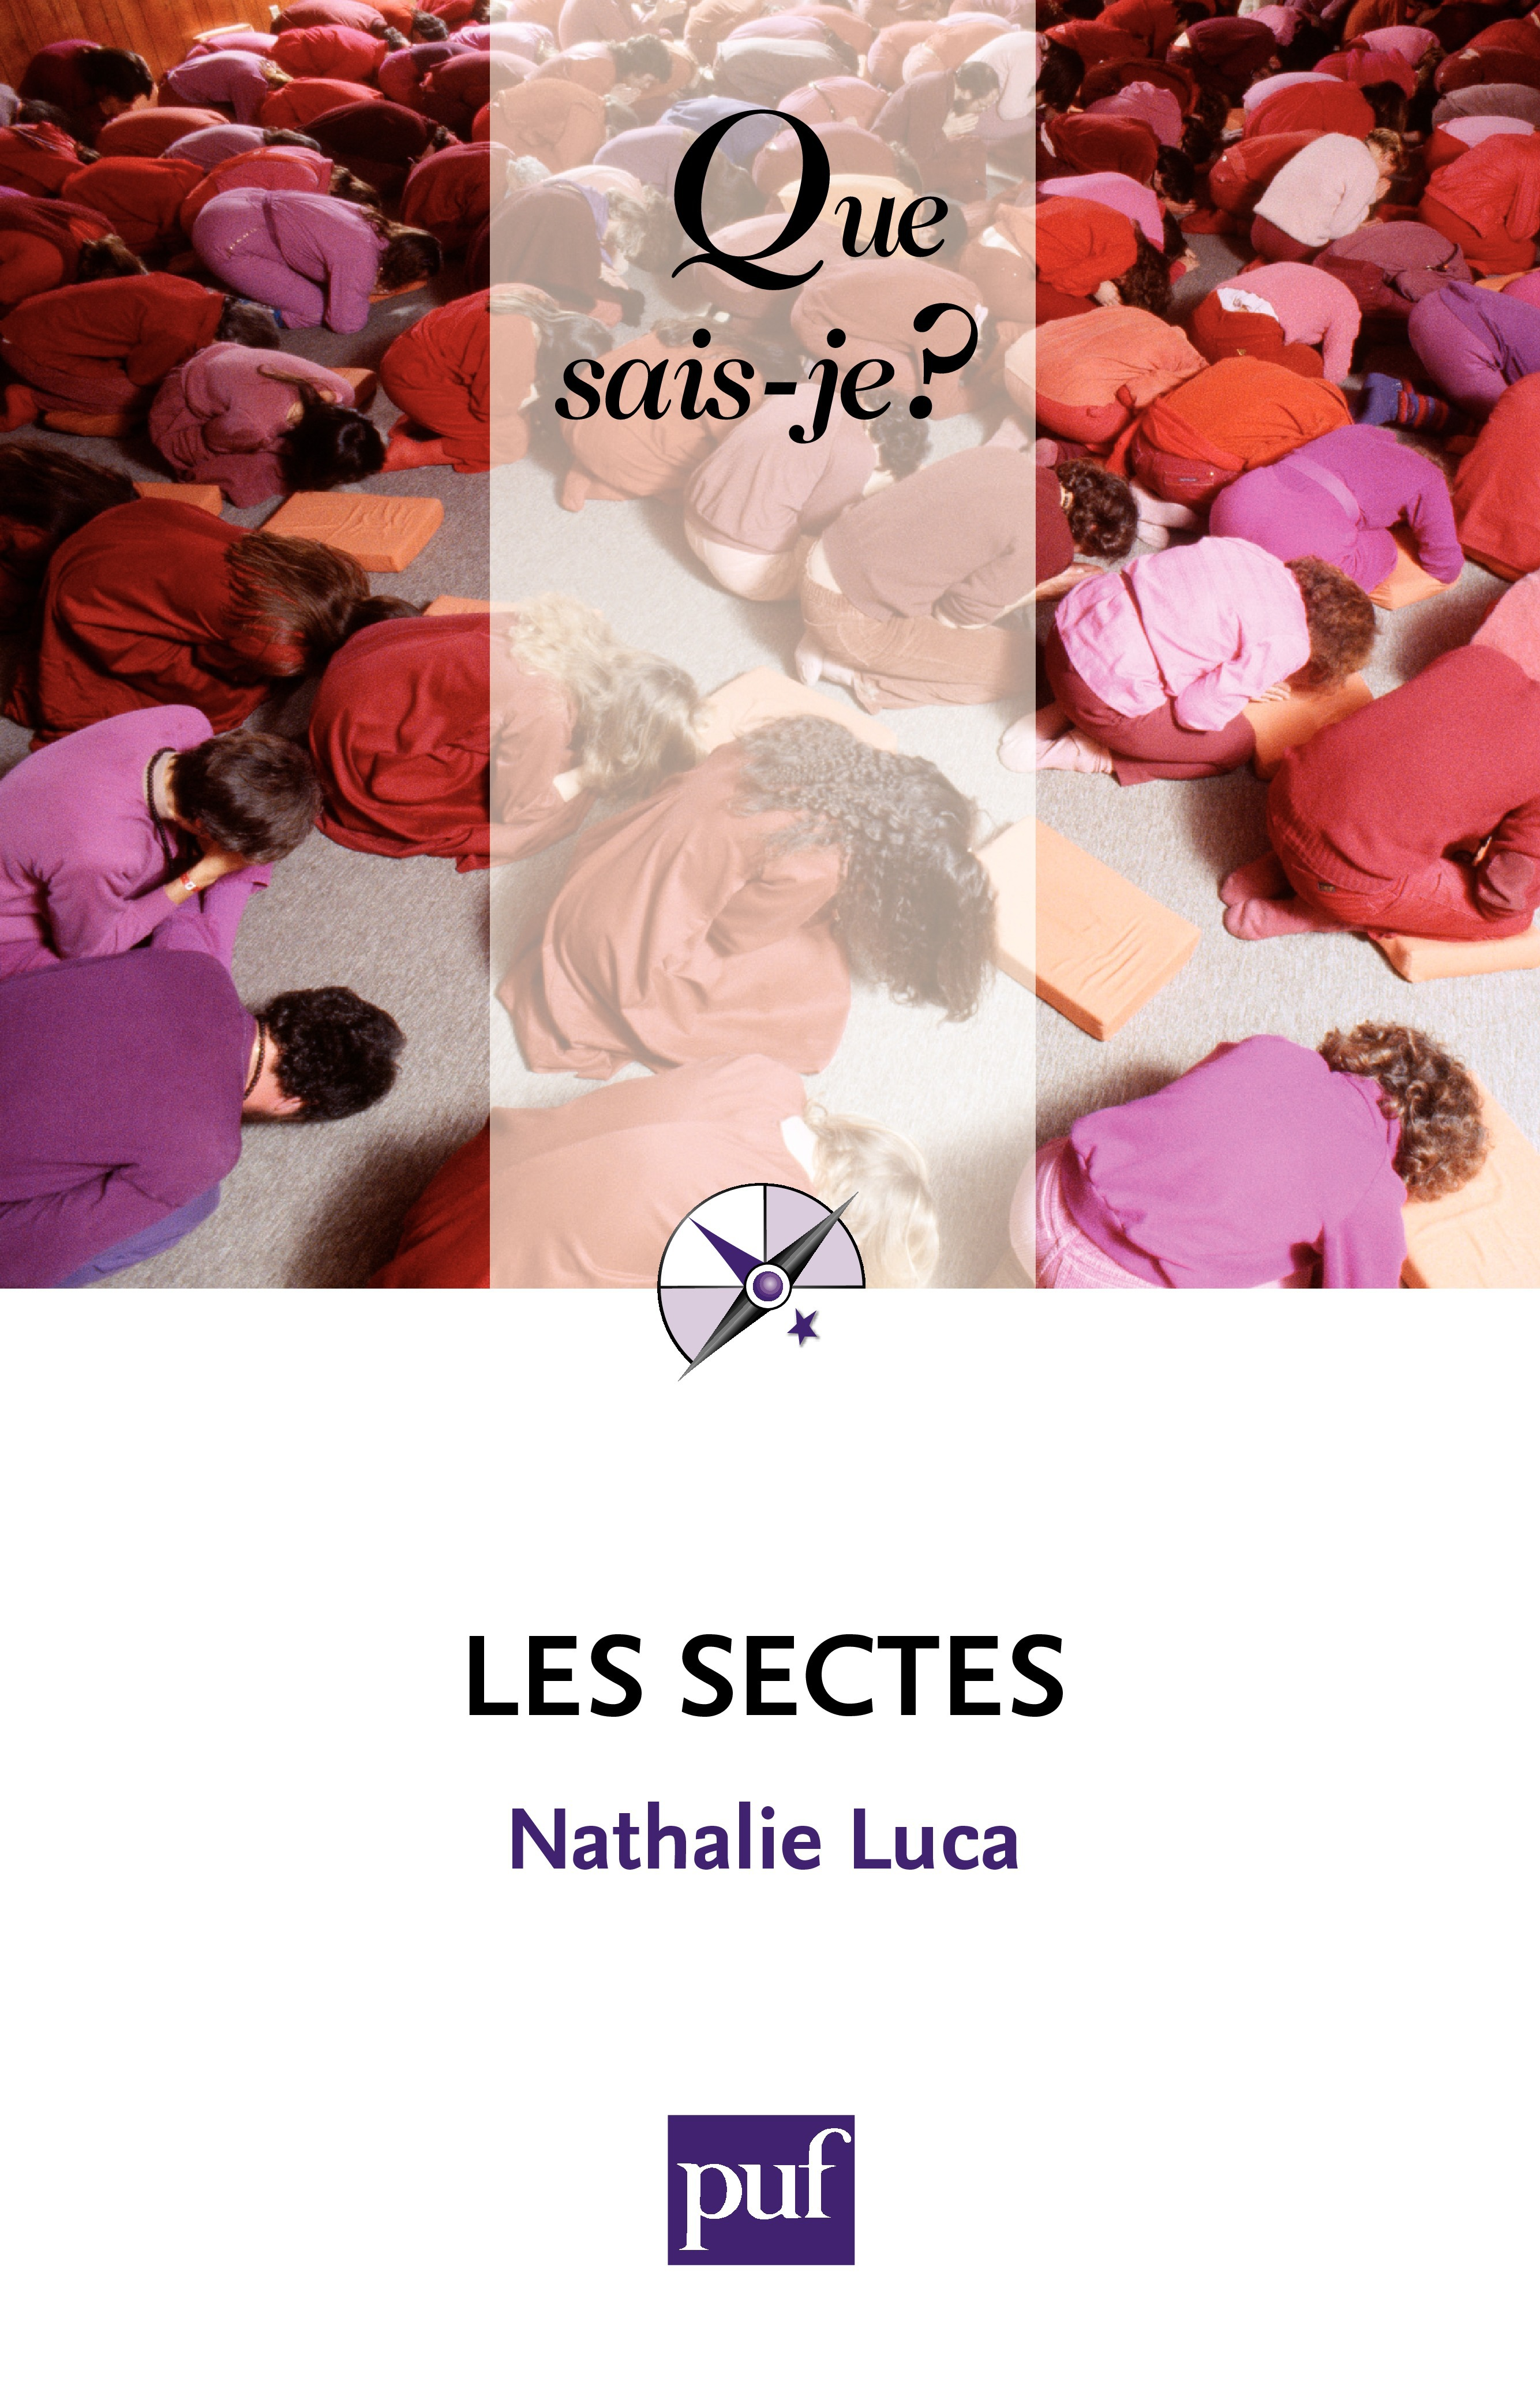 Nathalie Luca Les sectes